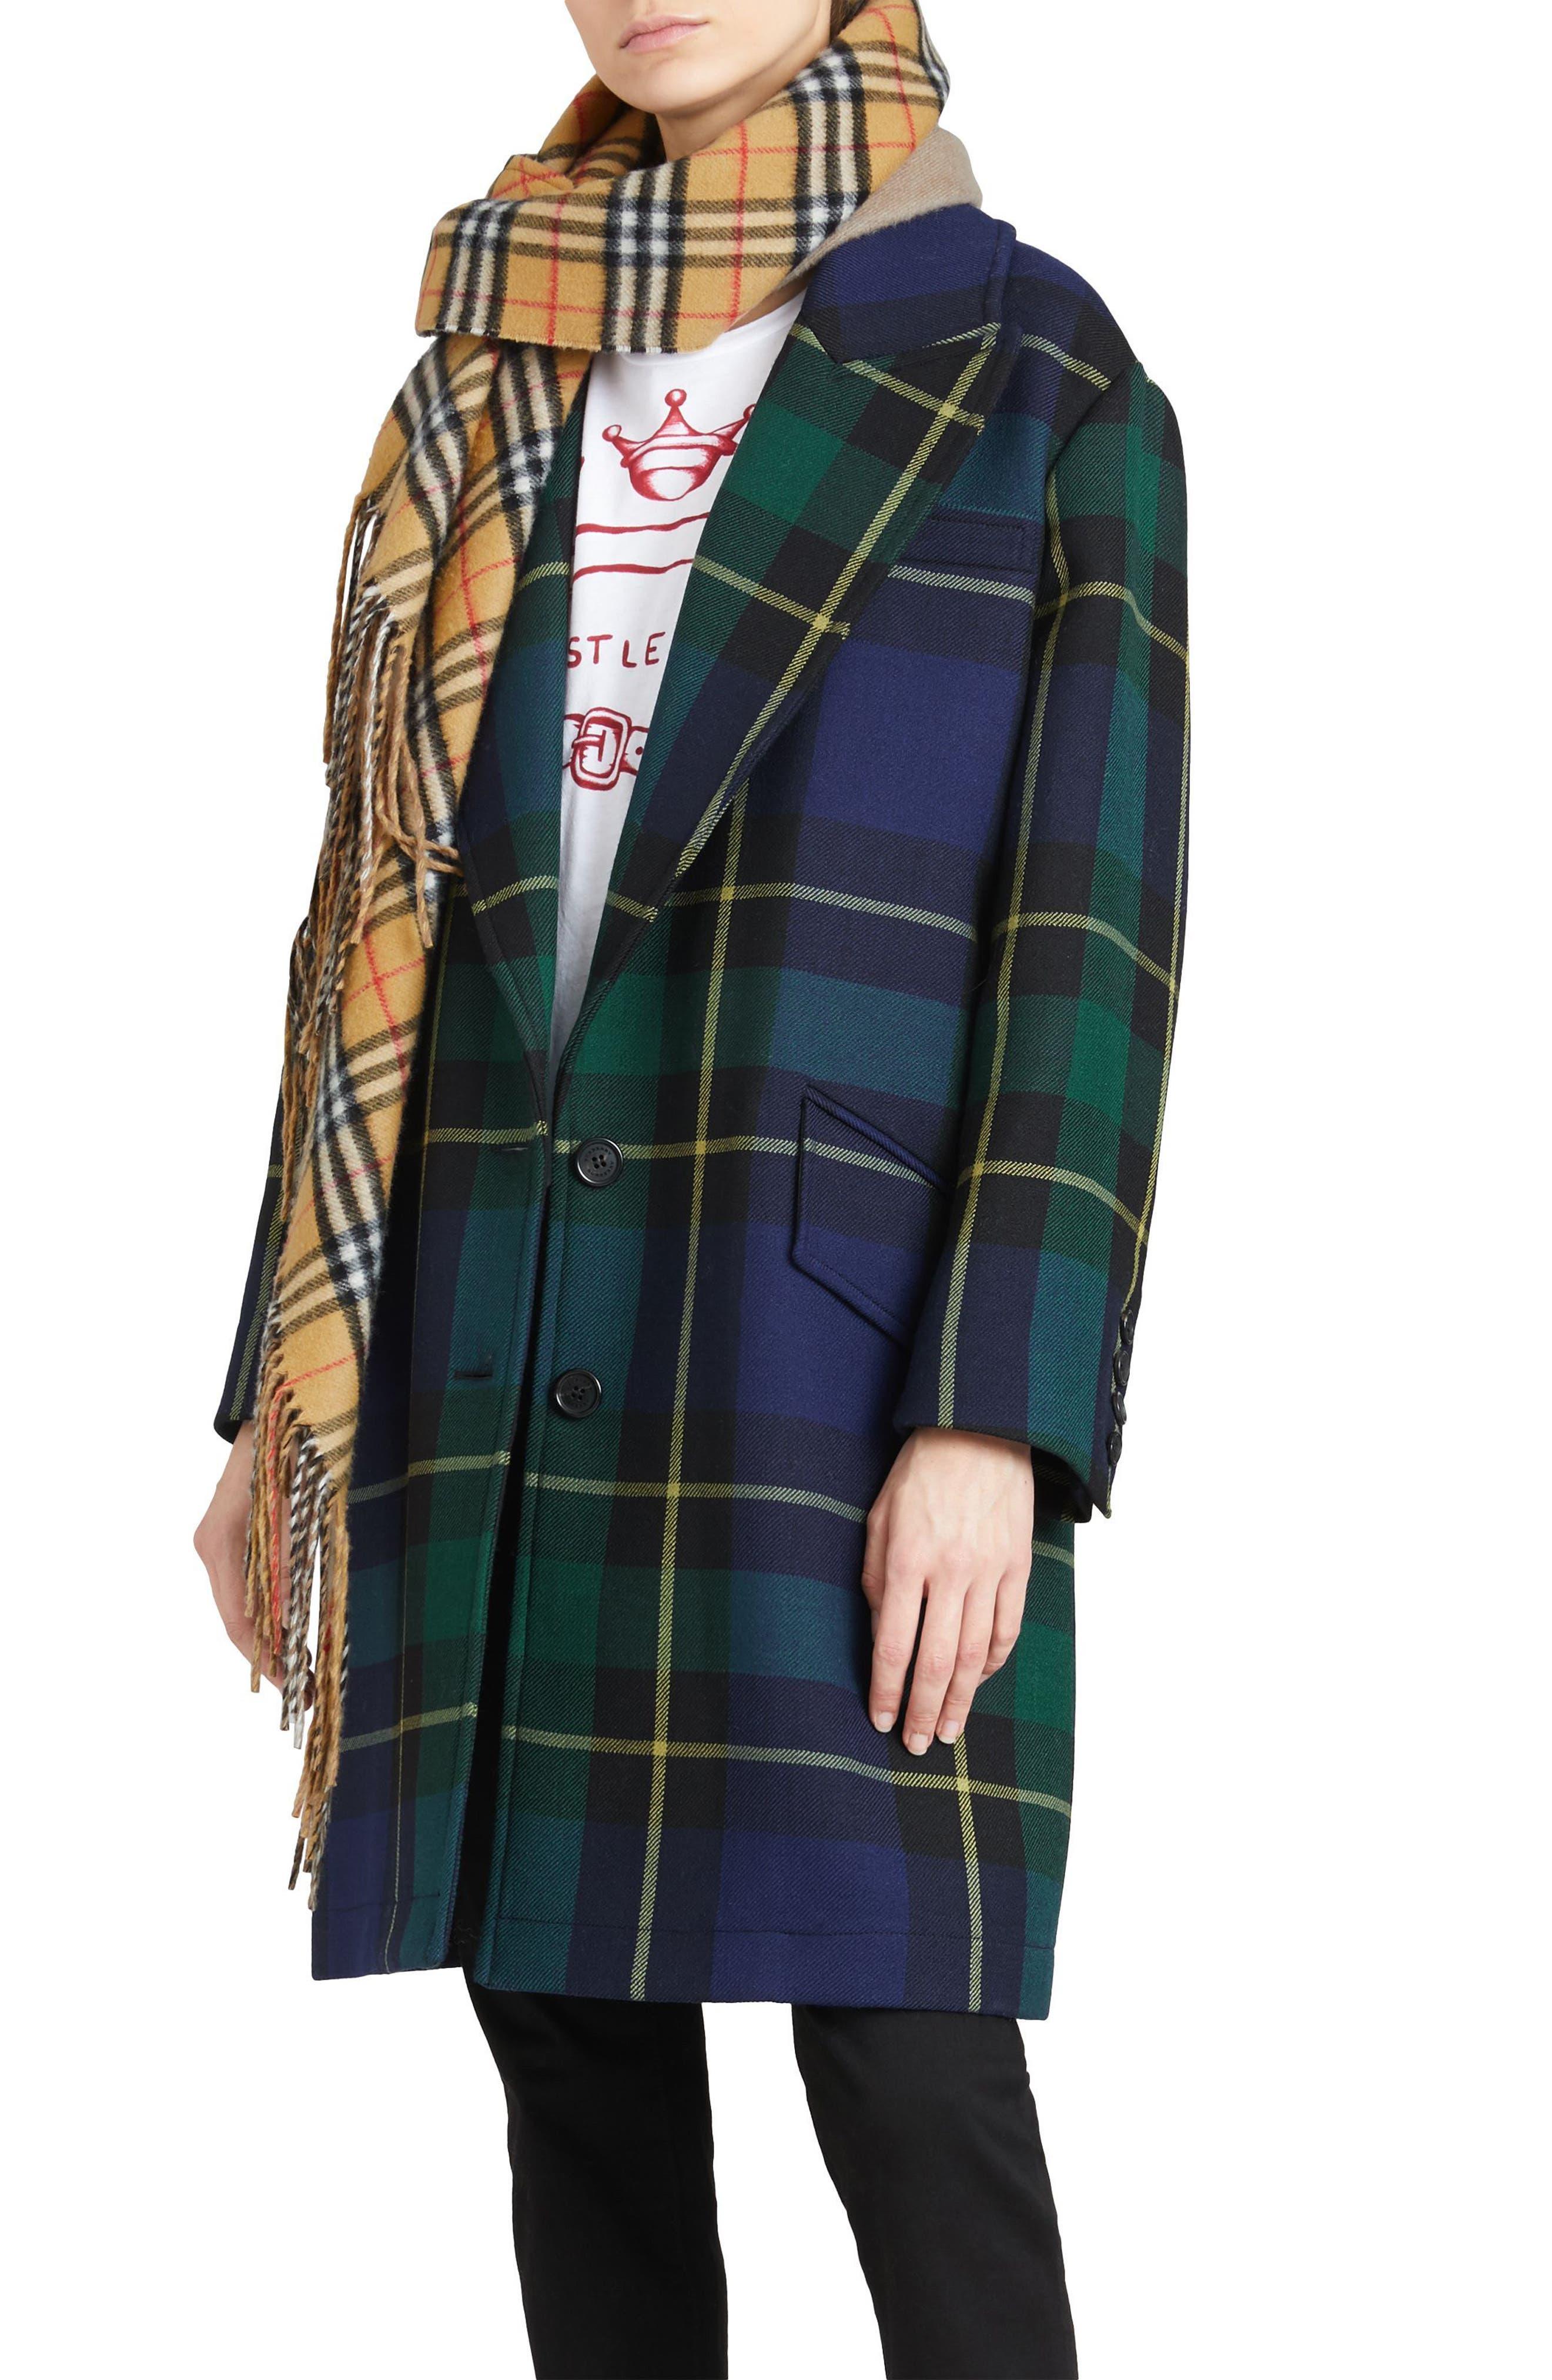 Strathyre Tartan Plaid Wool Blend Coat,                             Alternate thumbnail 3, color,                             303